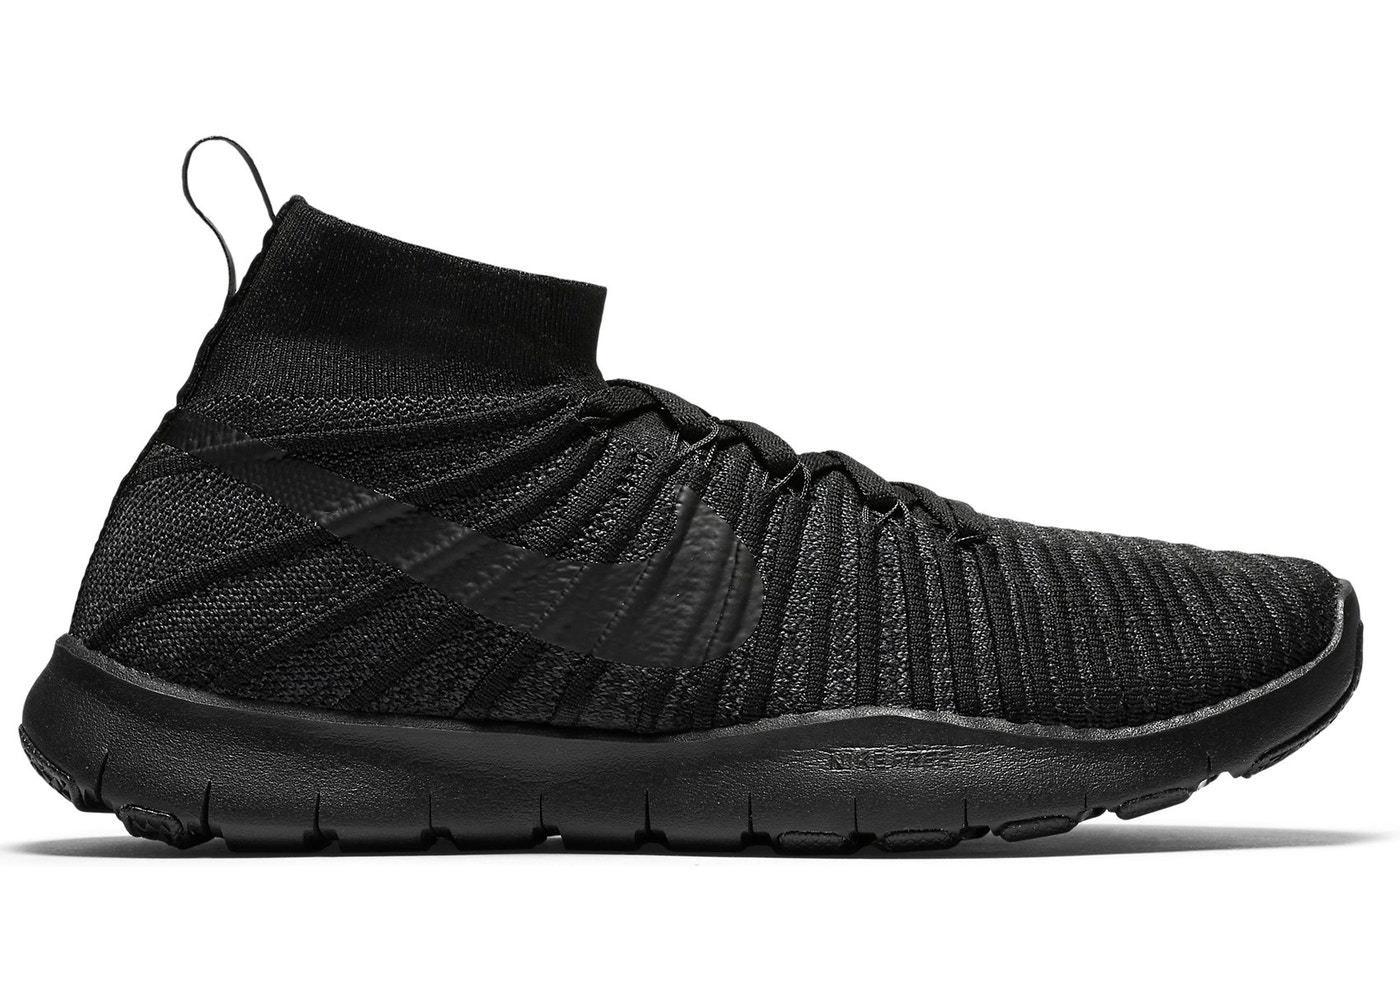 2ddd5d0e3d15 Nike Free TR Force Flyknit Riccardo Tisci Black - 844461-001